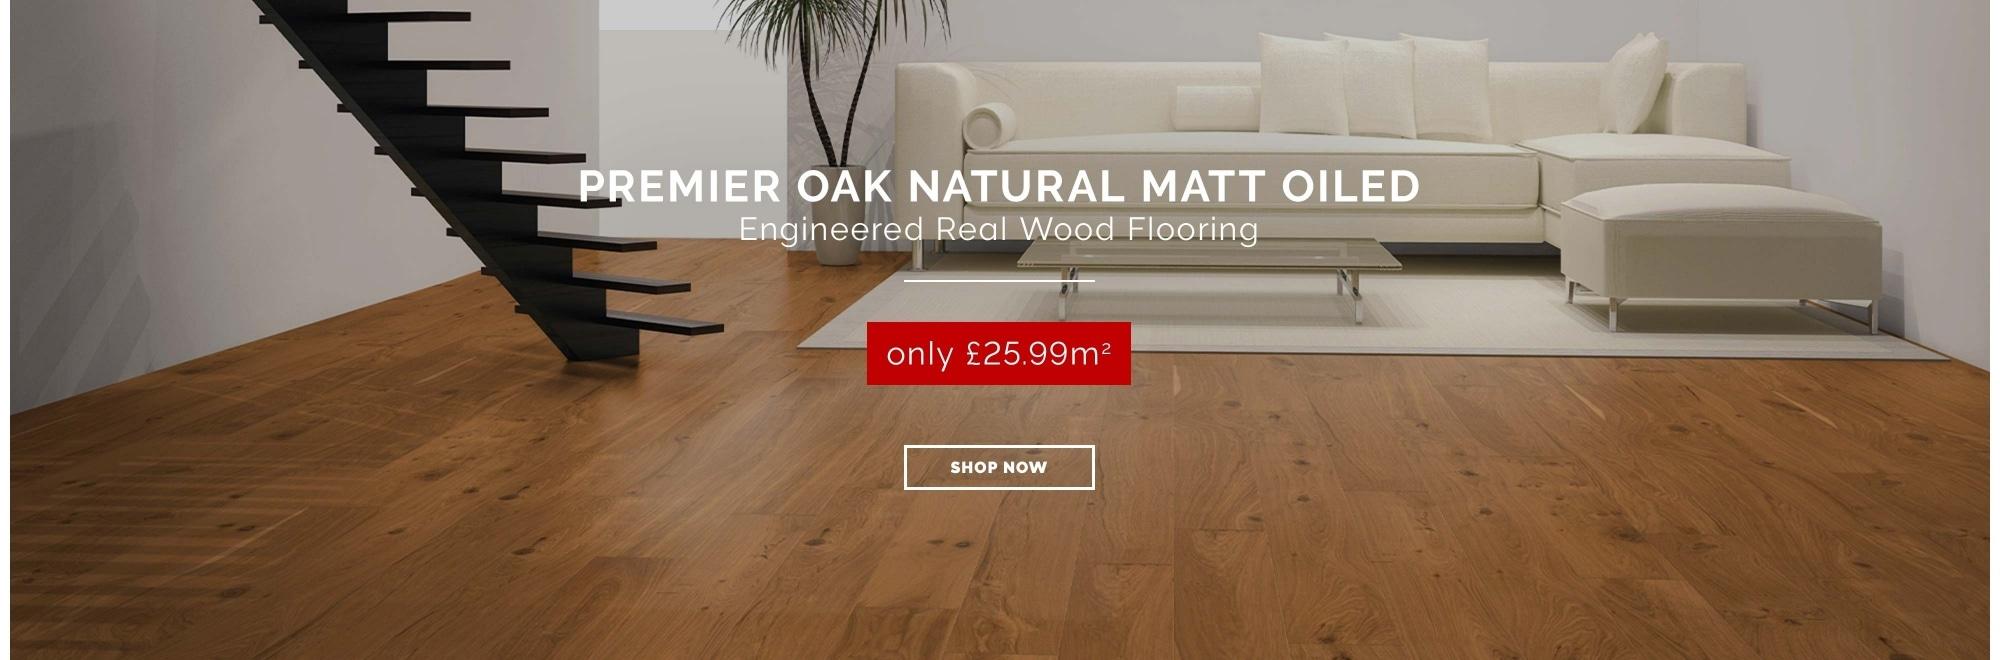 Premier Oak Natural Matt Engineered Flooring